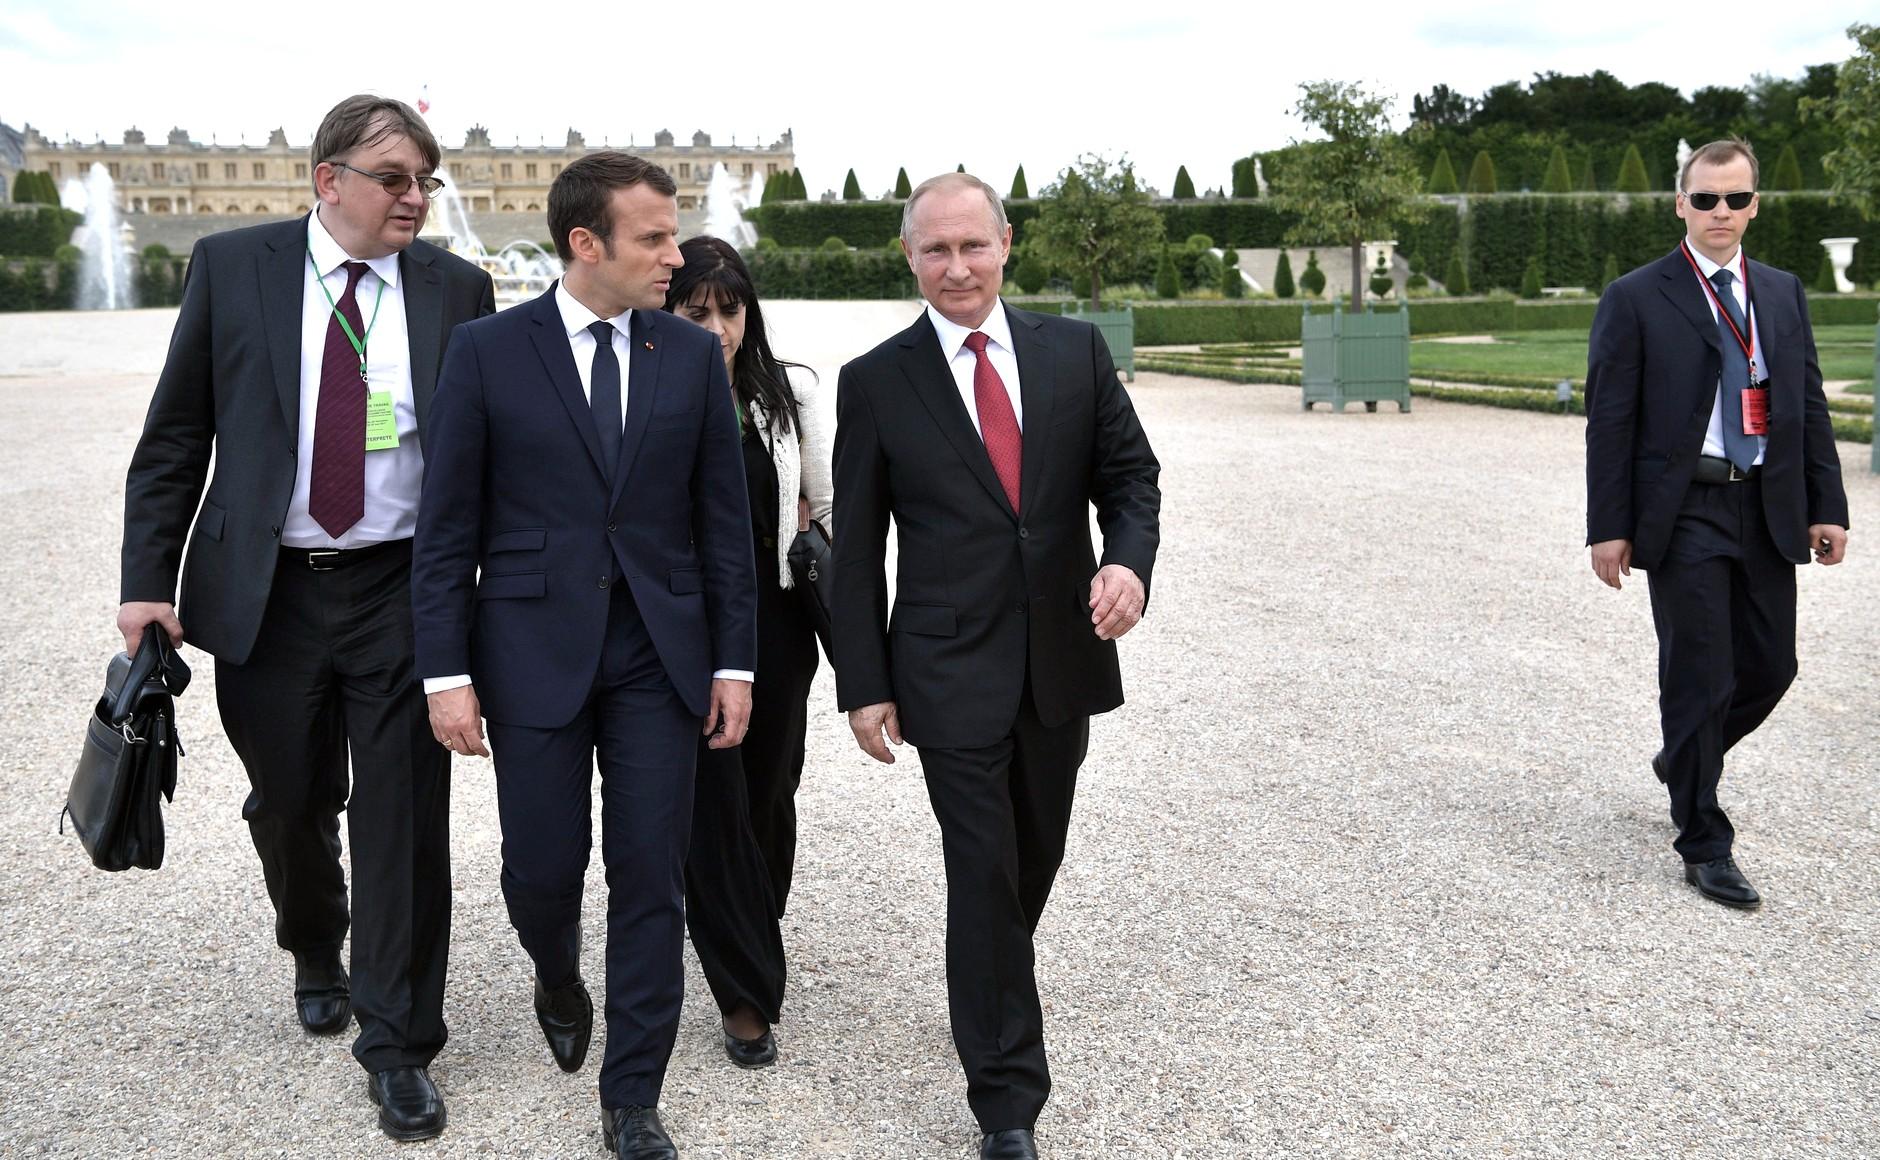 File Vladimir Putin And Emmanuel Macron 2017 05 29 20 Jpg Wikimedia Commons